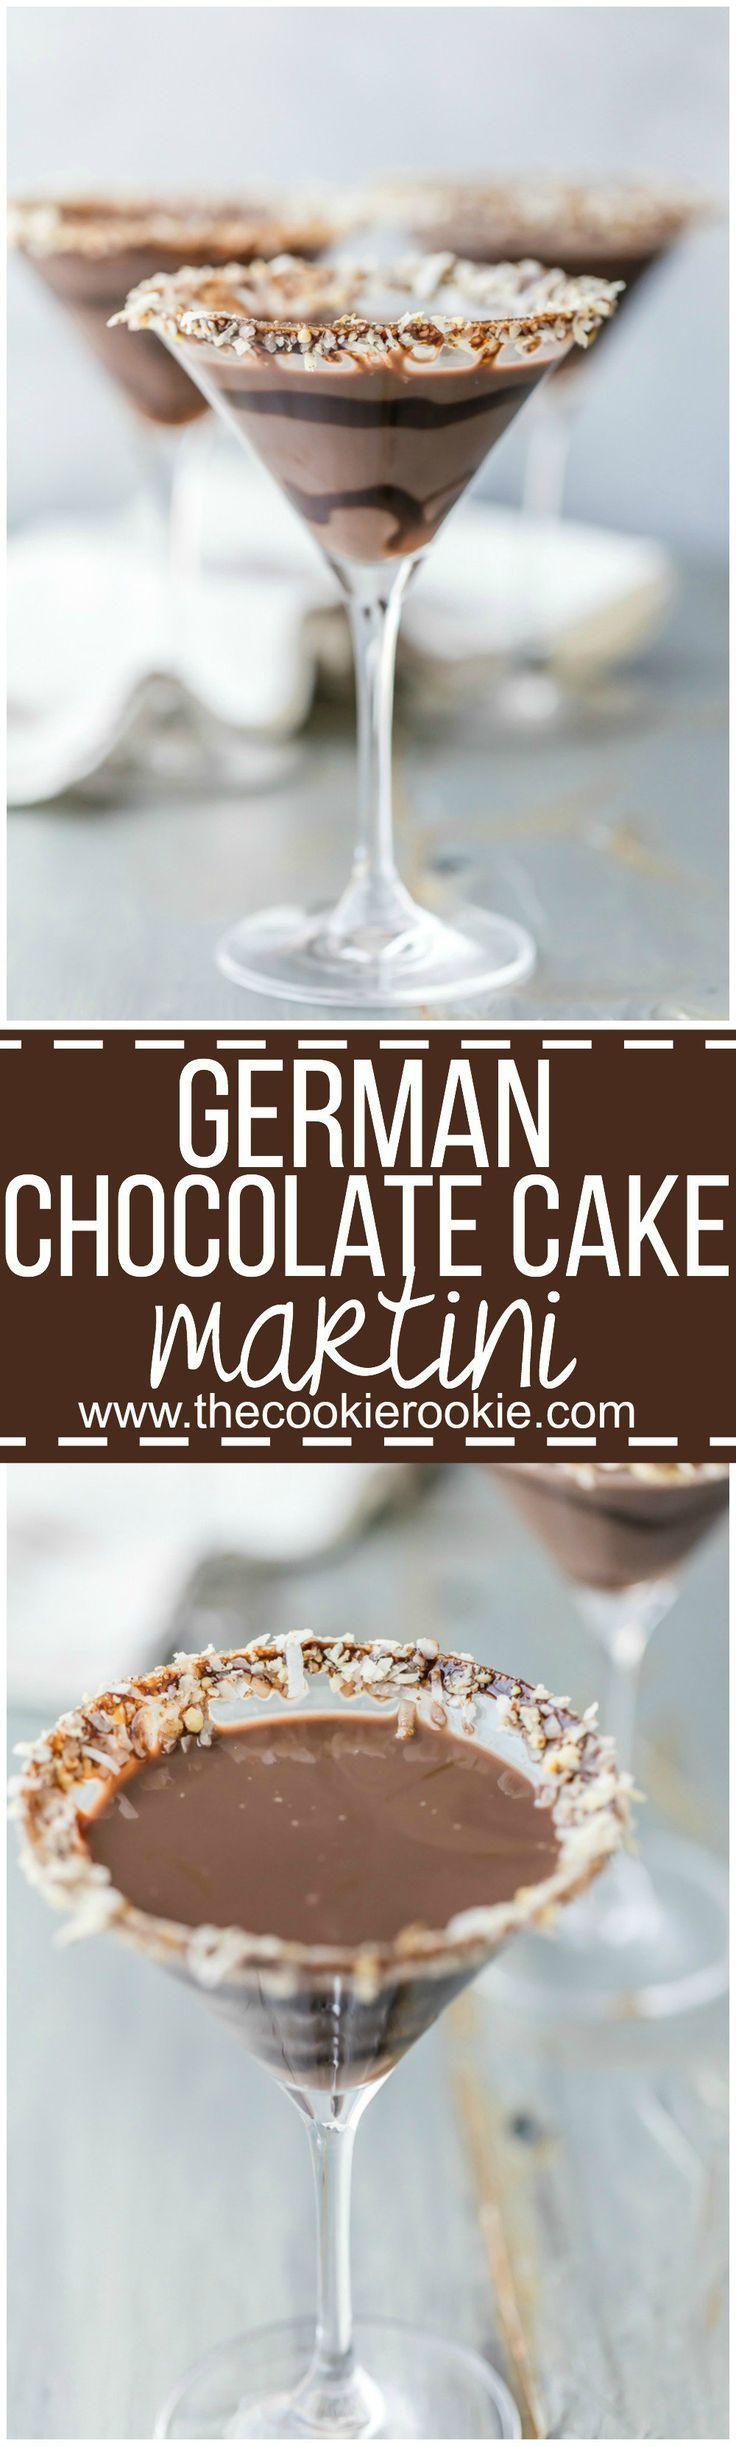 Best 25+ Chocolate cake shot ideas on Pinterest | Chocolate cake ...